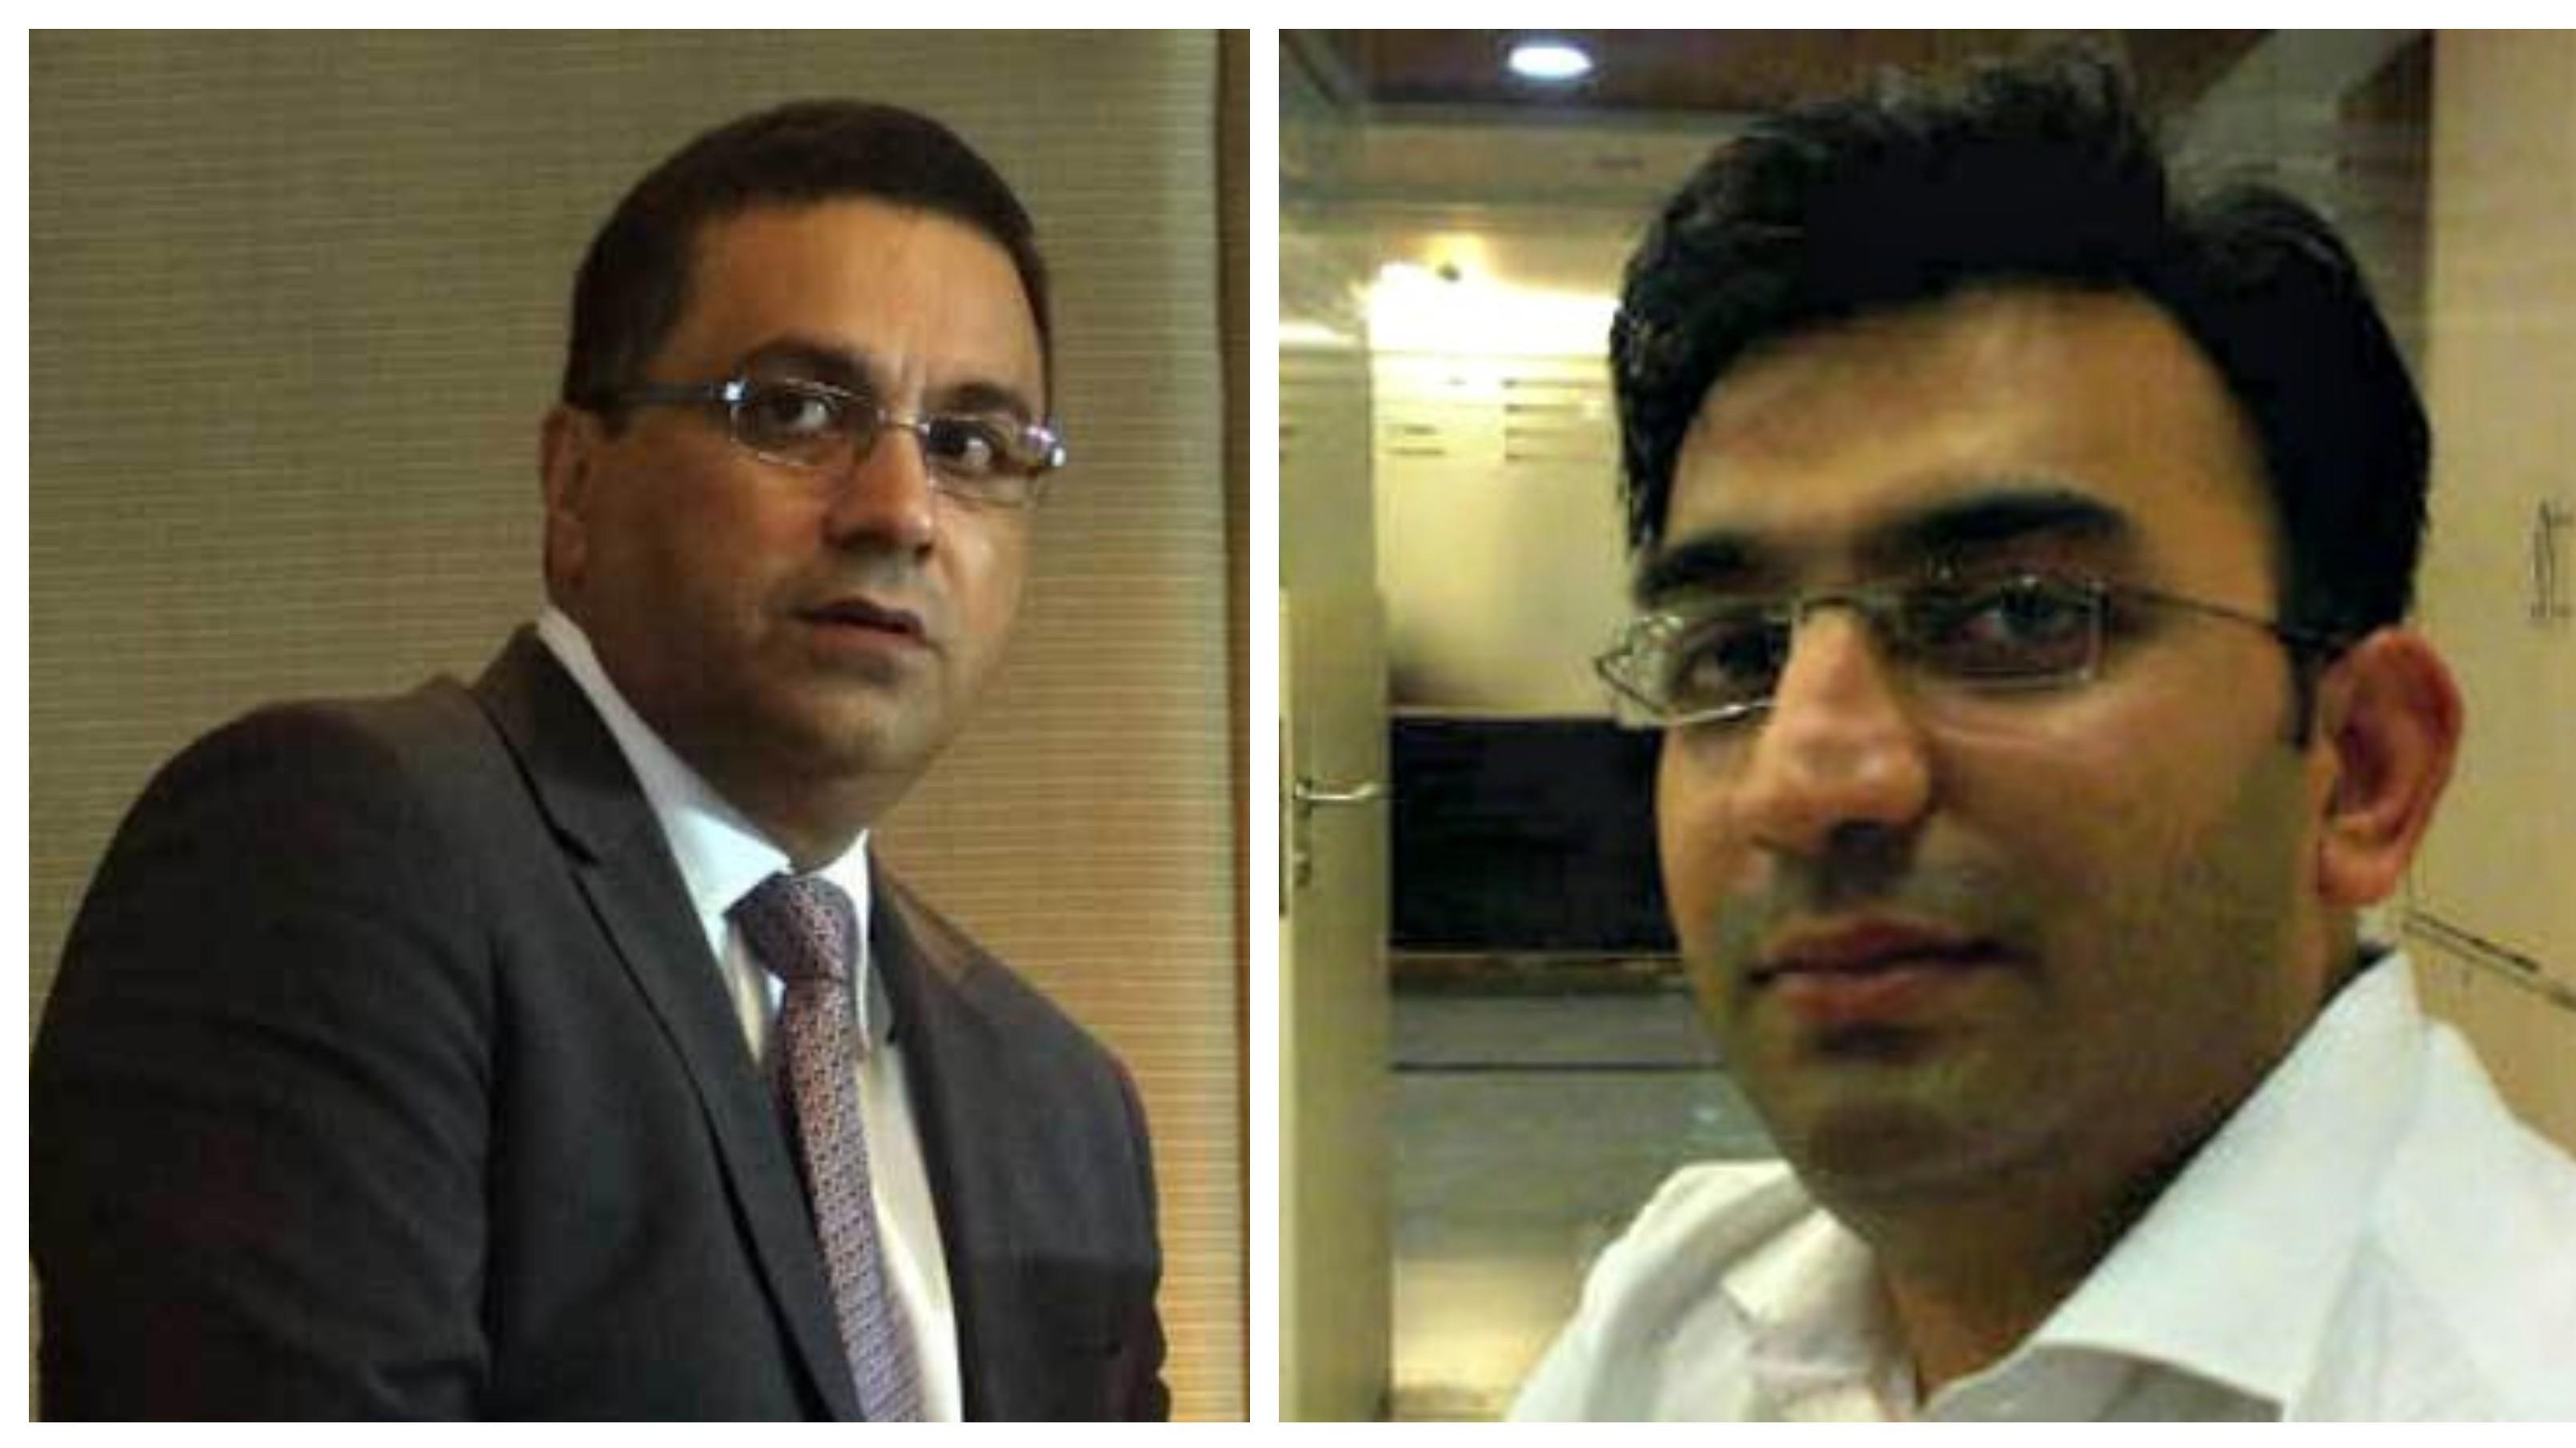 Hemang Amin appointed interim BCCI CEO after Rahul Johri's resignation